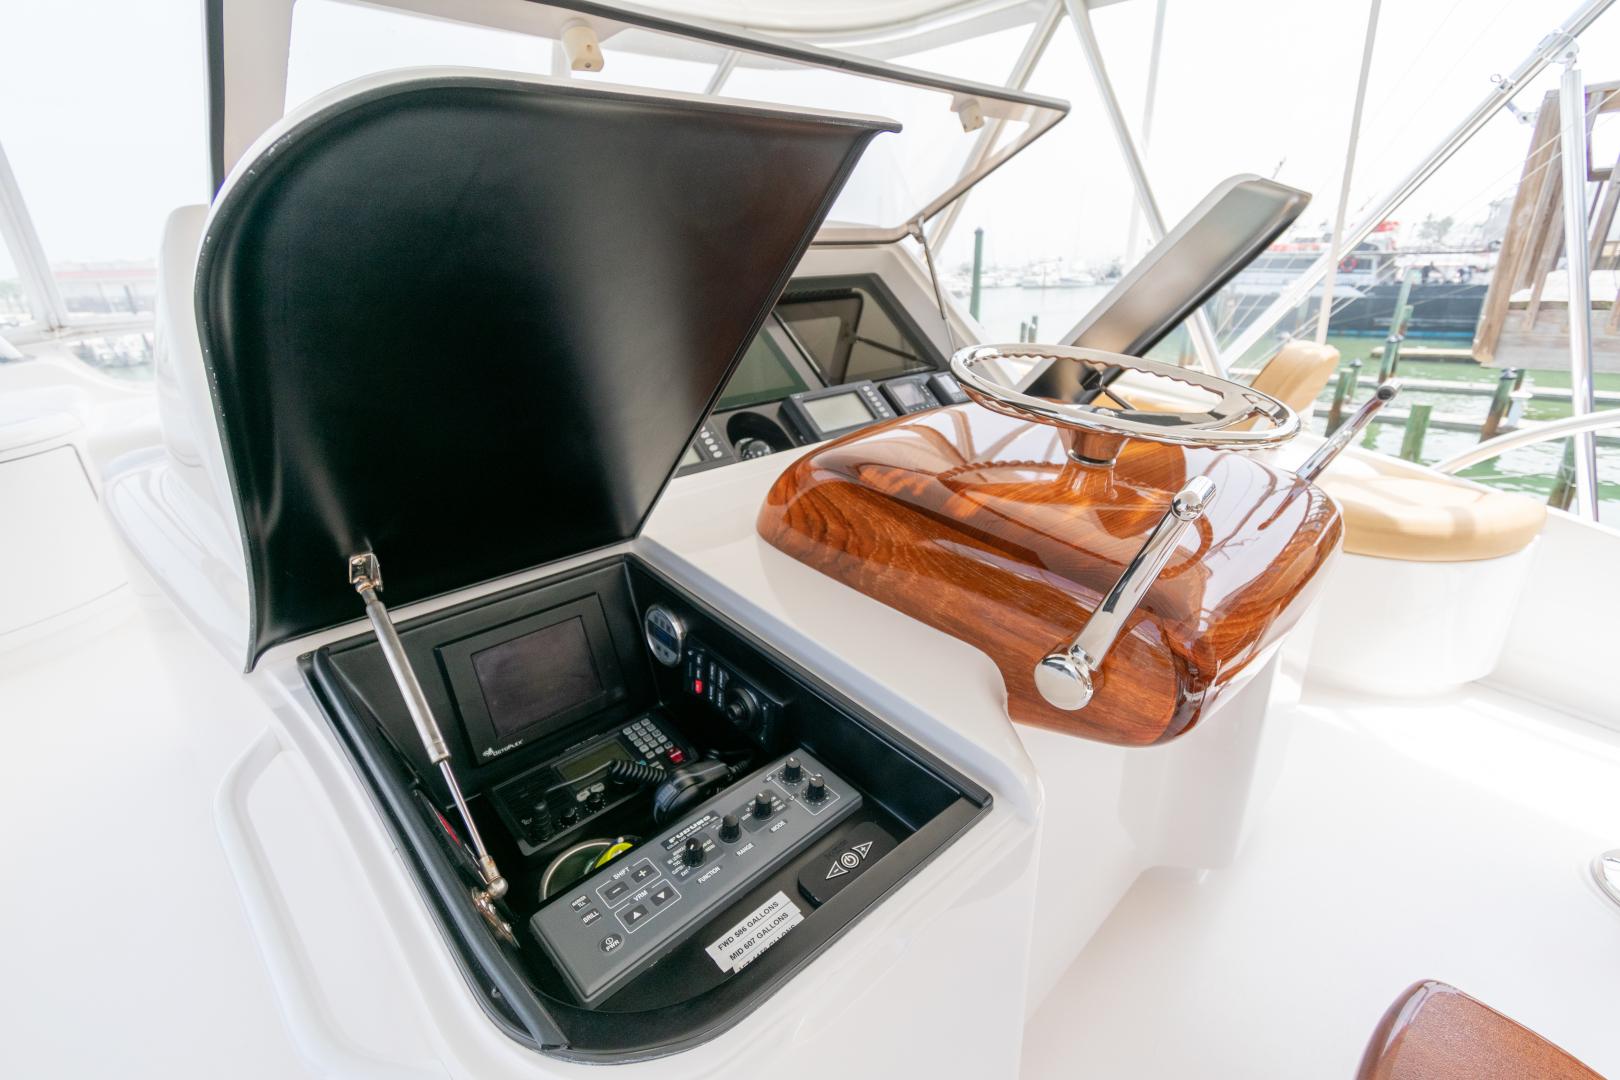 Viking-70 Convertible 2014-Load N Go Port Aransas-Texas-United States-2014 70 Viking Load N Go Helm (1)-1380597 | Thumbnail